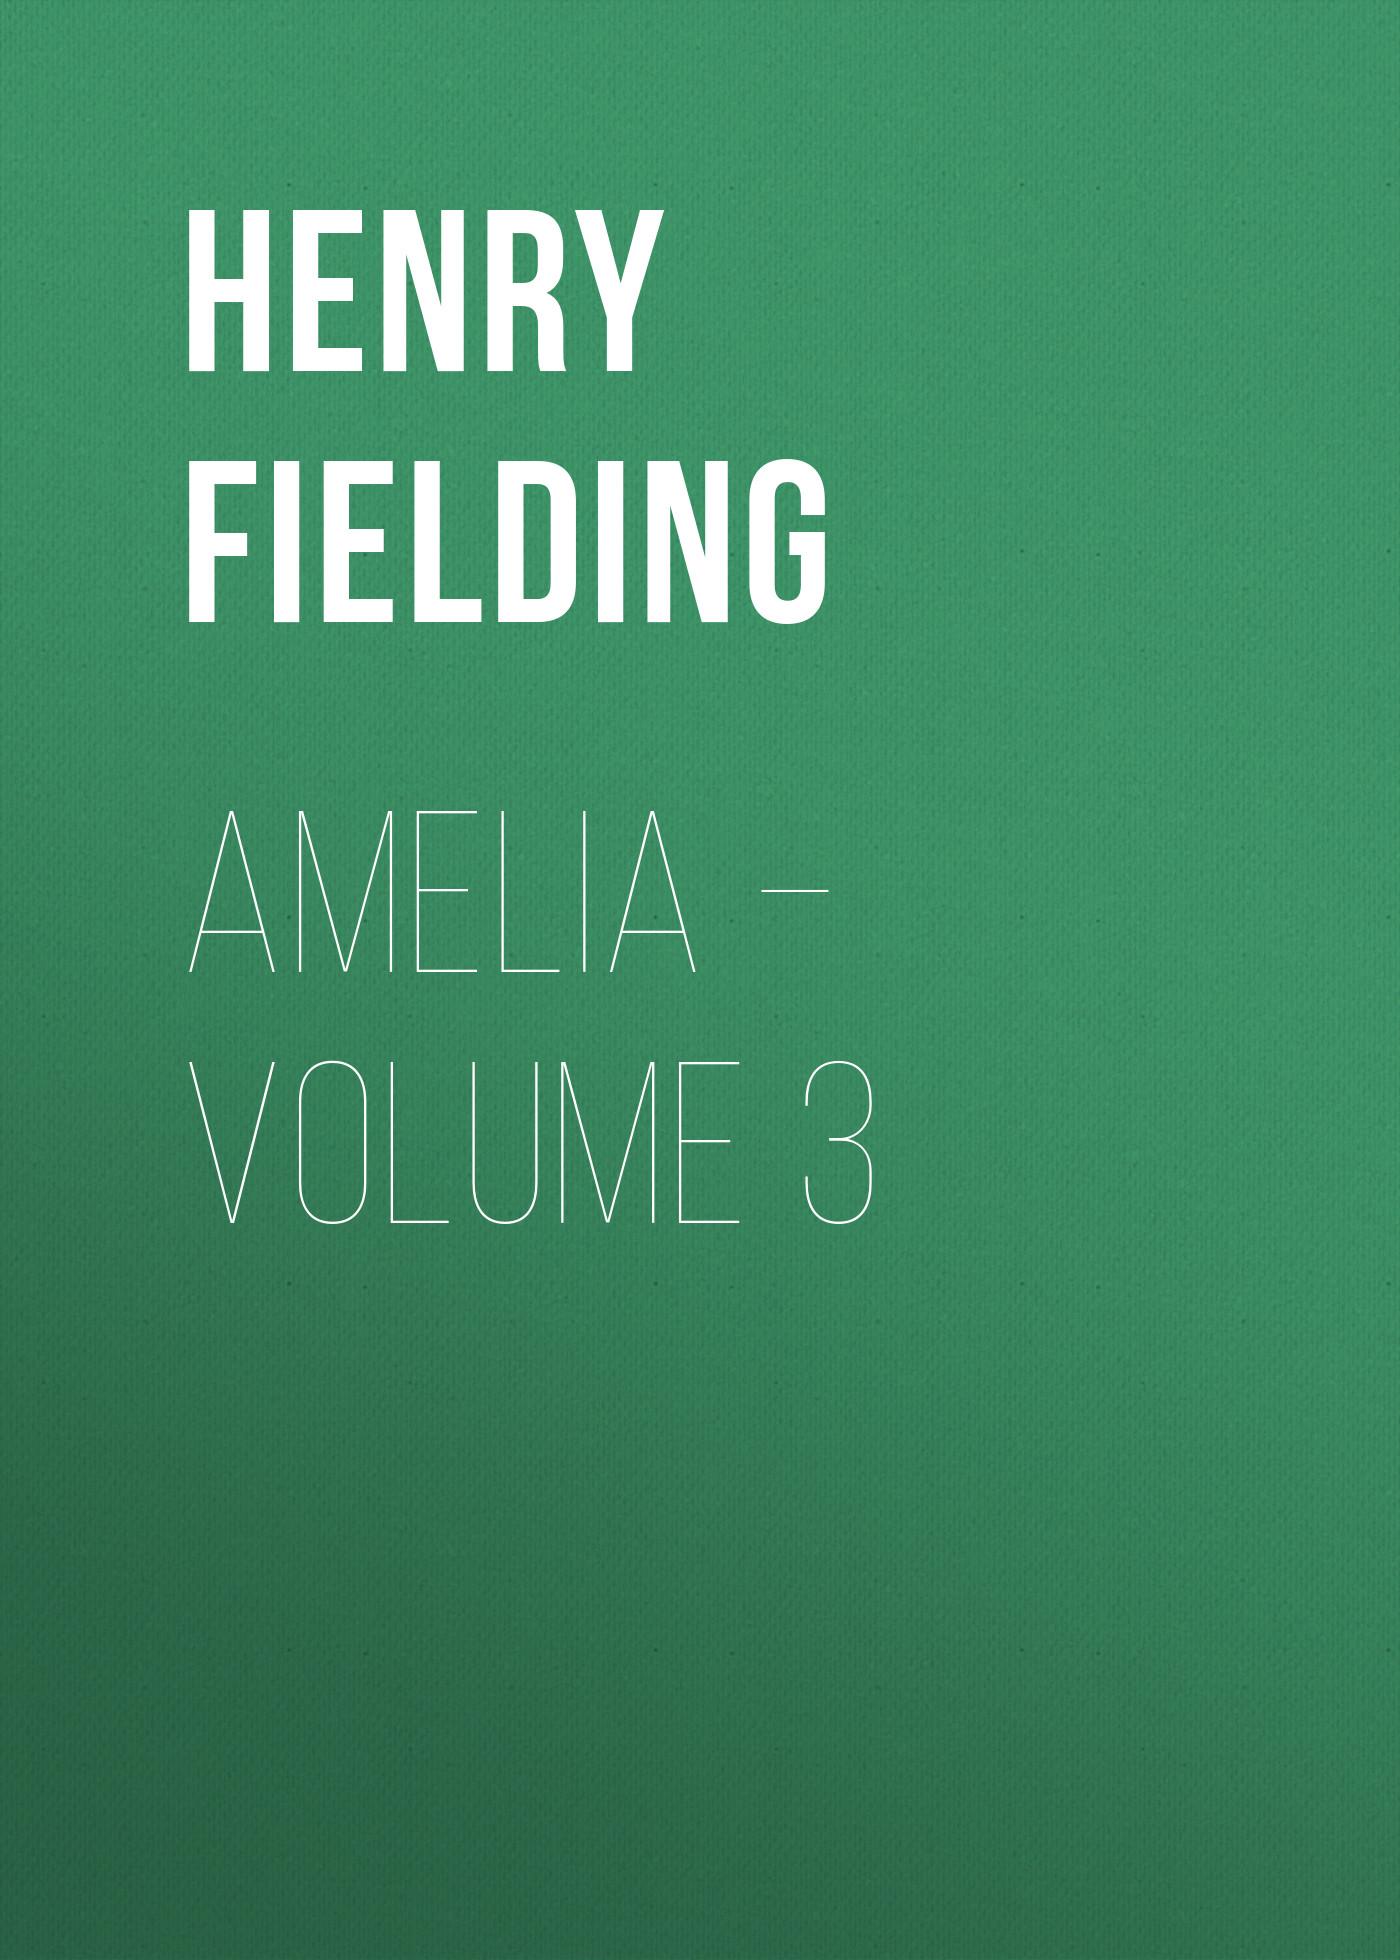 Генри Филдинг Amelia – Volume 3 генри филдинг the works vol 10